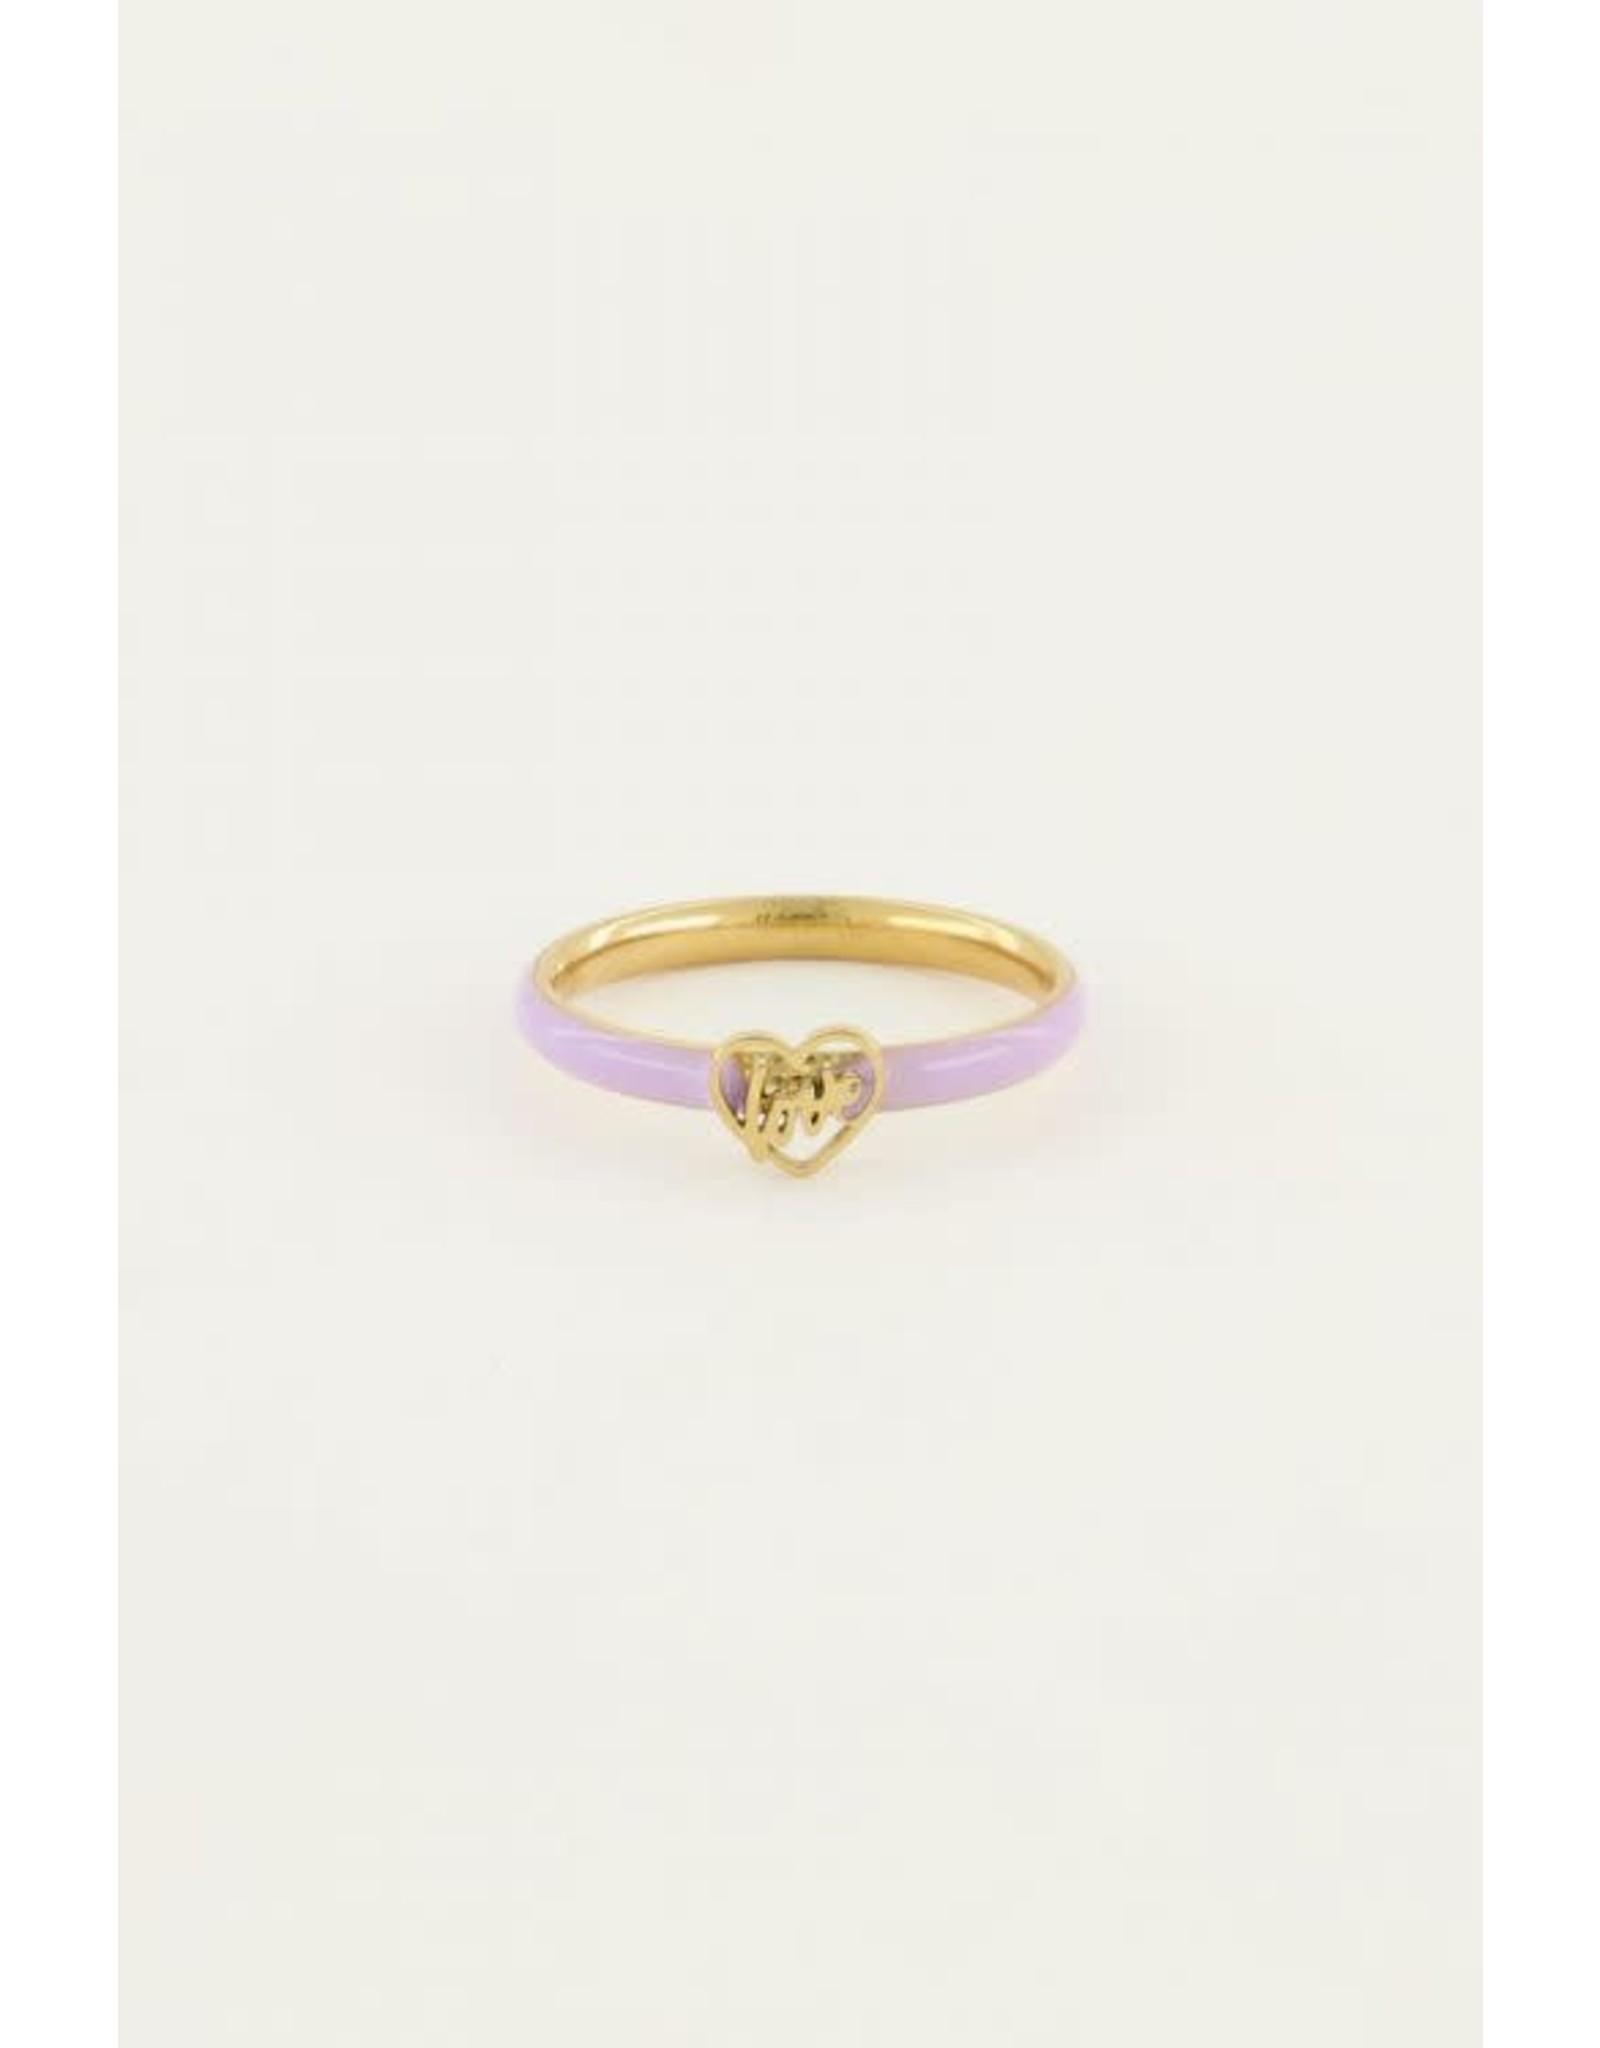 My Jewellery My Jewellery ring lila love